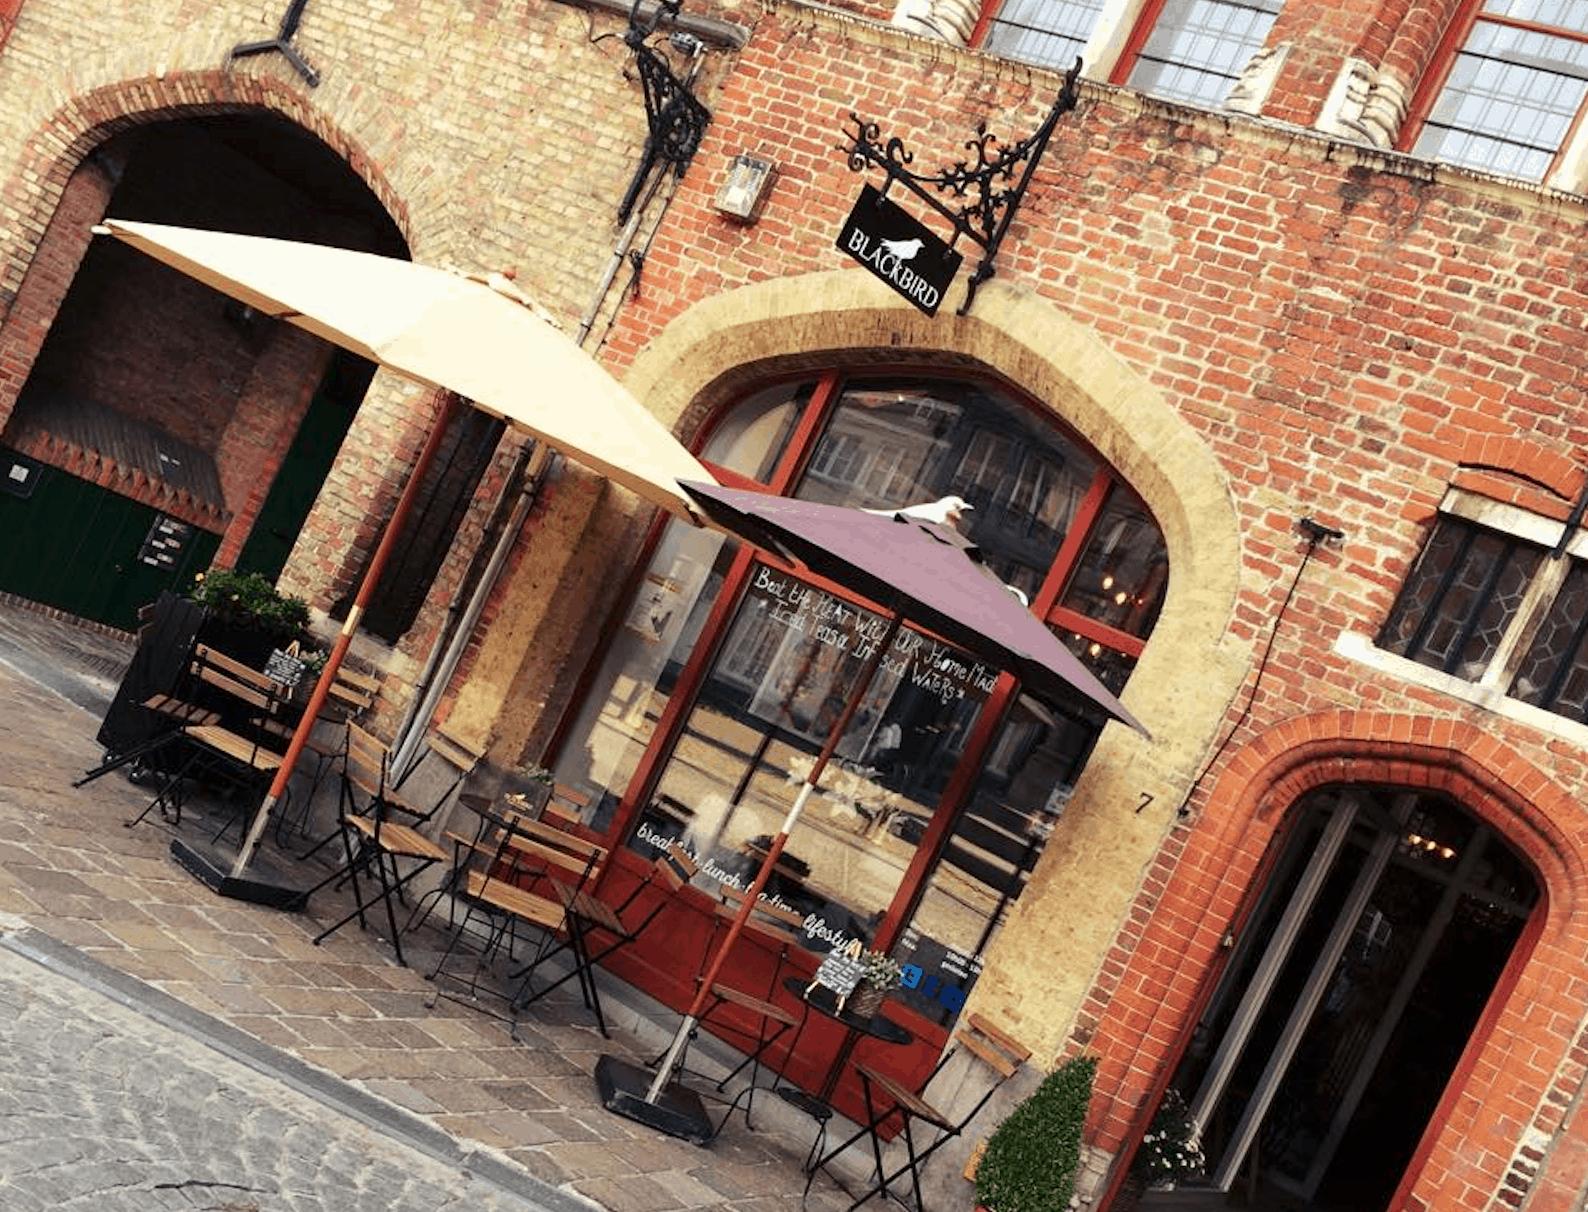 Blackbird in Brugge